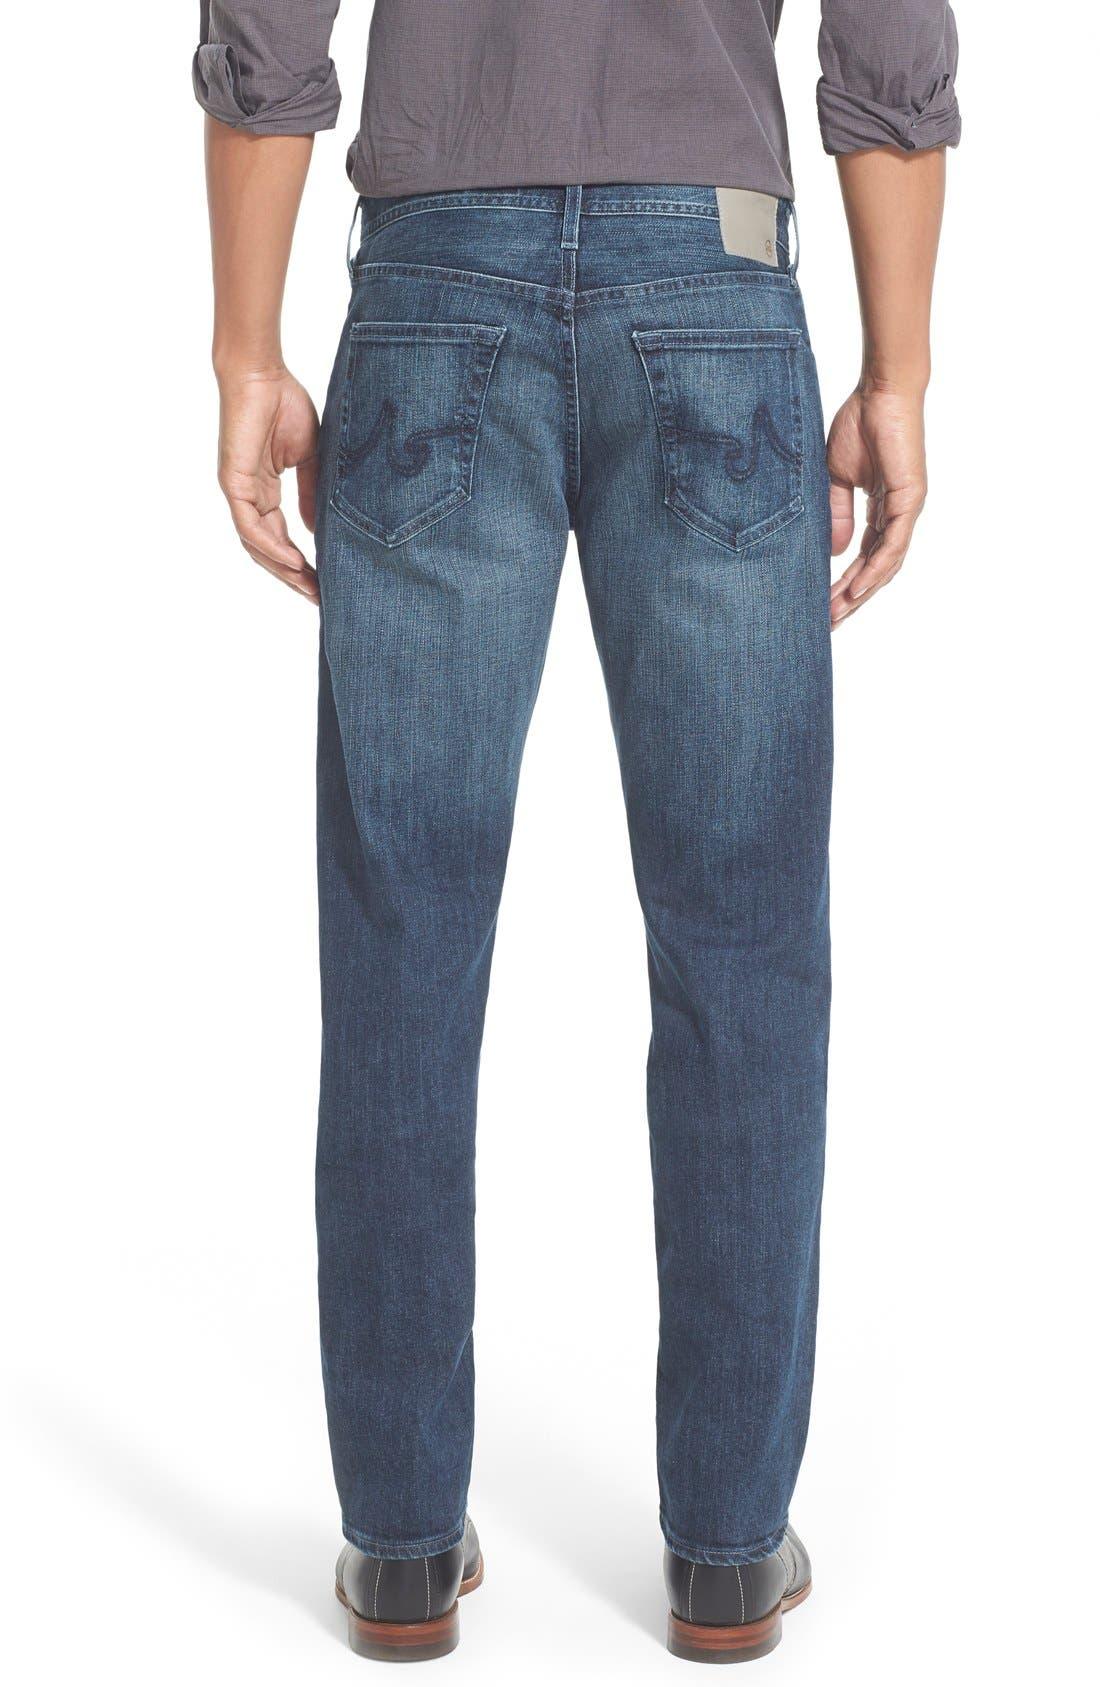 'Graduate' Slim Straight Leg Jeans,                             Alternate thumbnail 2, color,                             Stallow